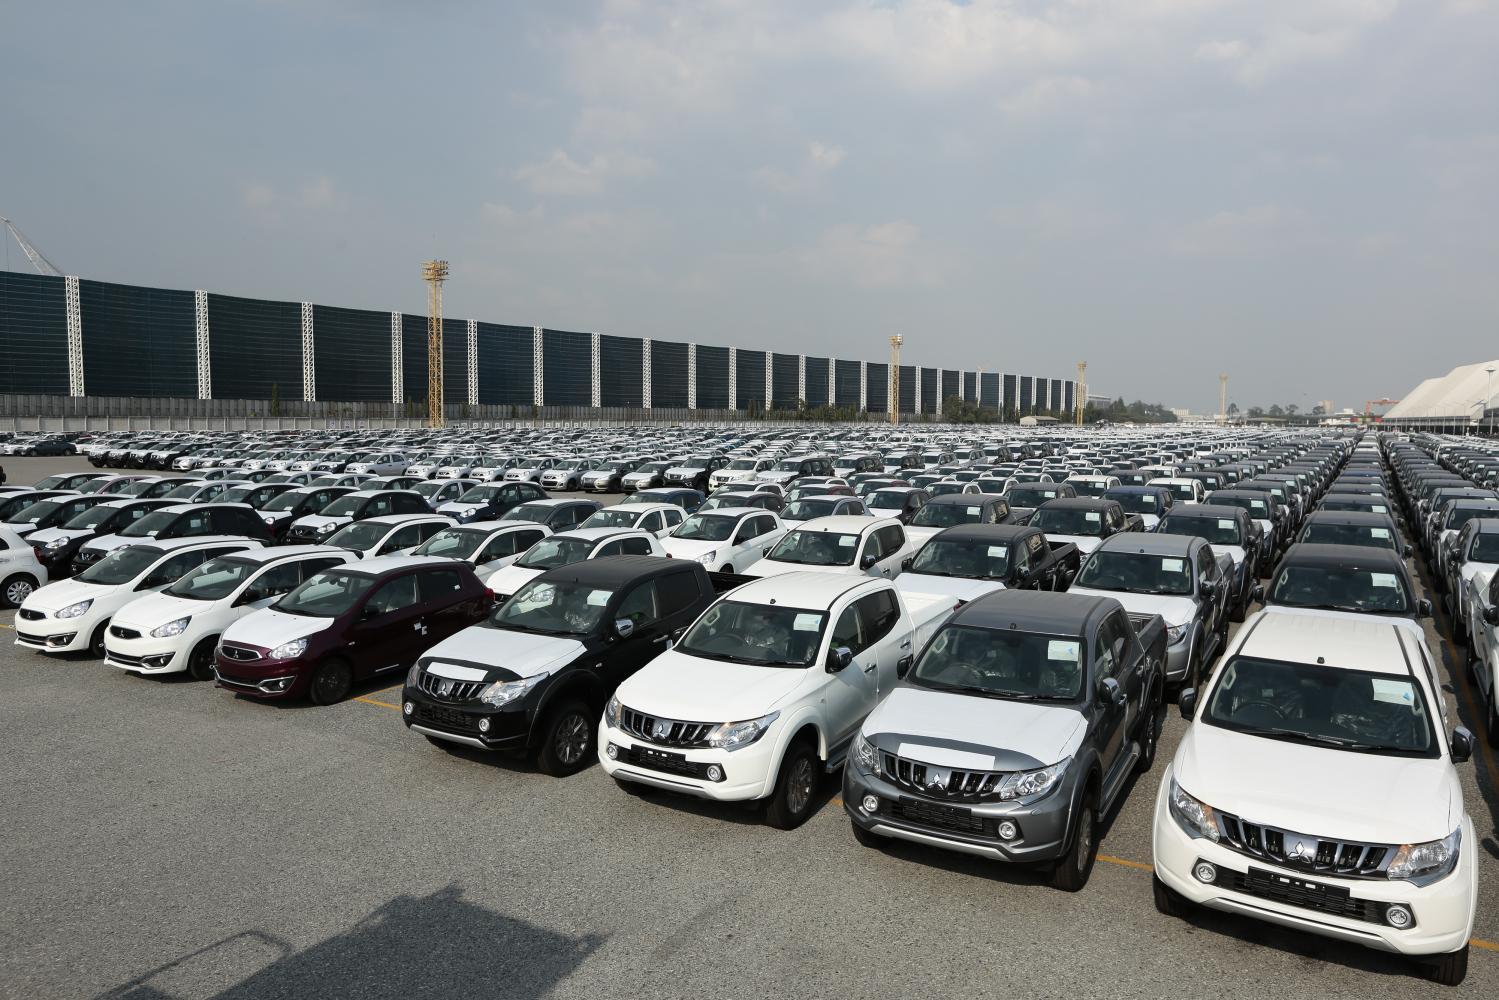 Cars sit ready for export at Laem Chabang Port in Chon Buri province.(Photo by Patipat Janthong)